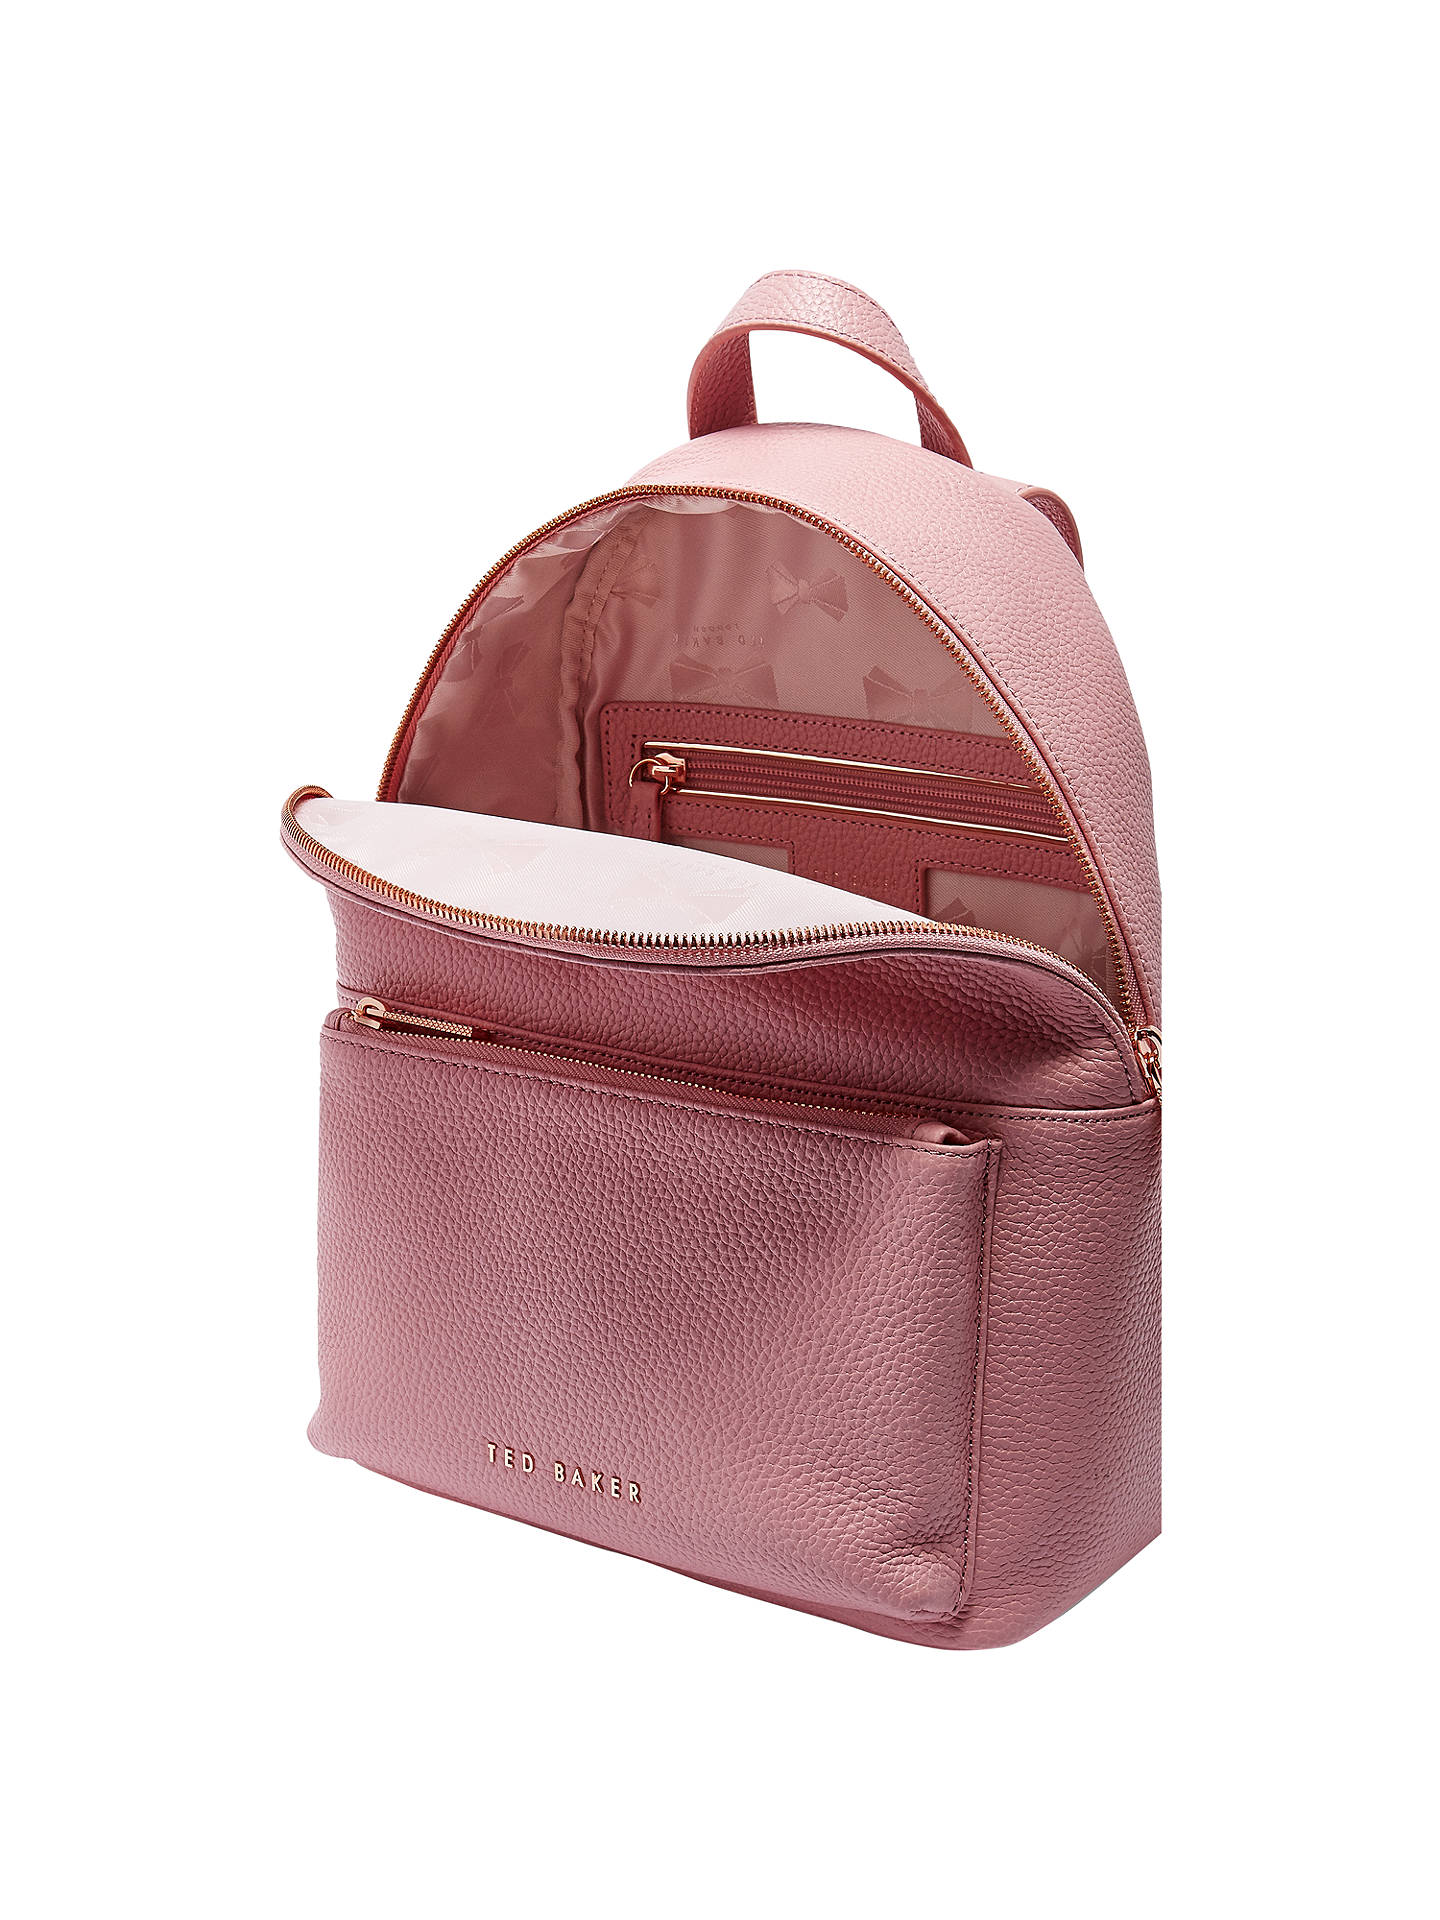 2fb2bc04b ... Buy Ted Baker Pearen Leather Backpack, Dusky Pink Online at  johnlewis.com ...